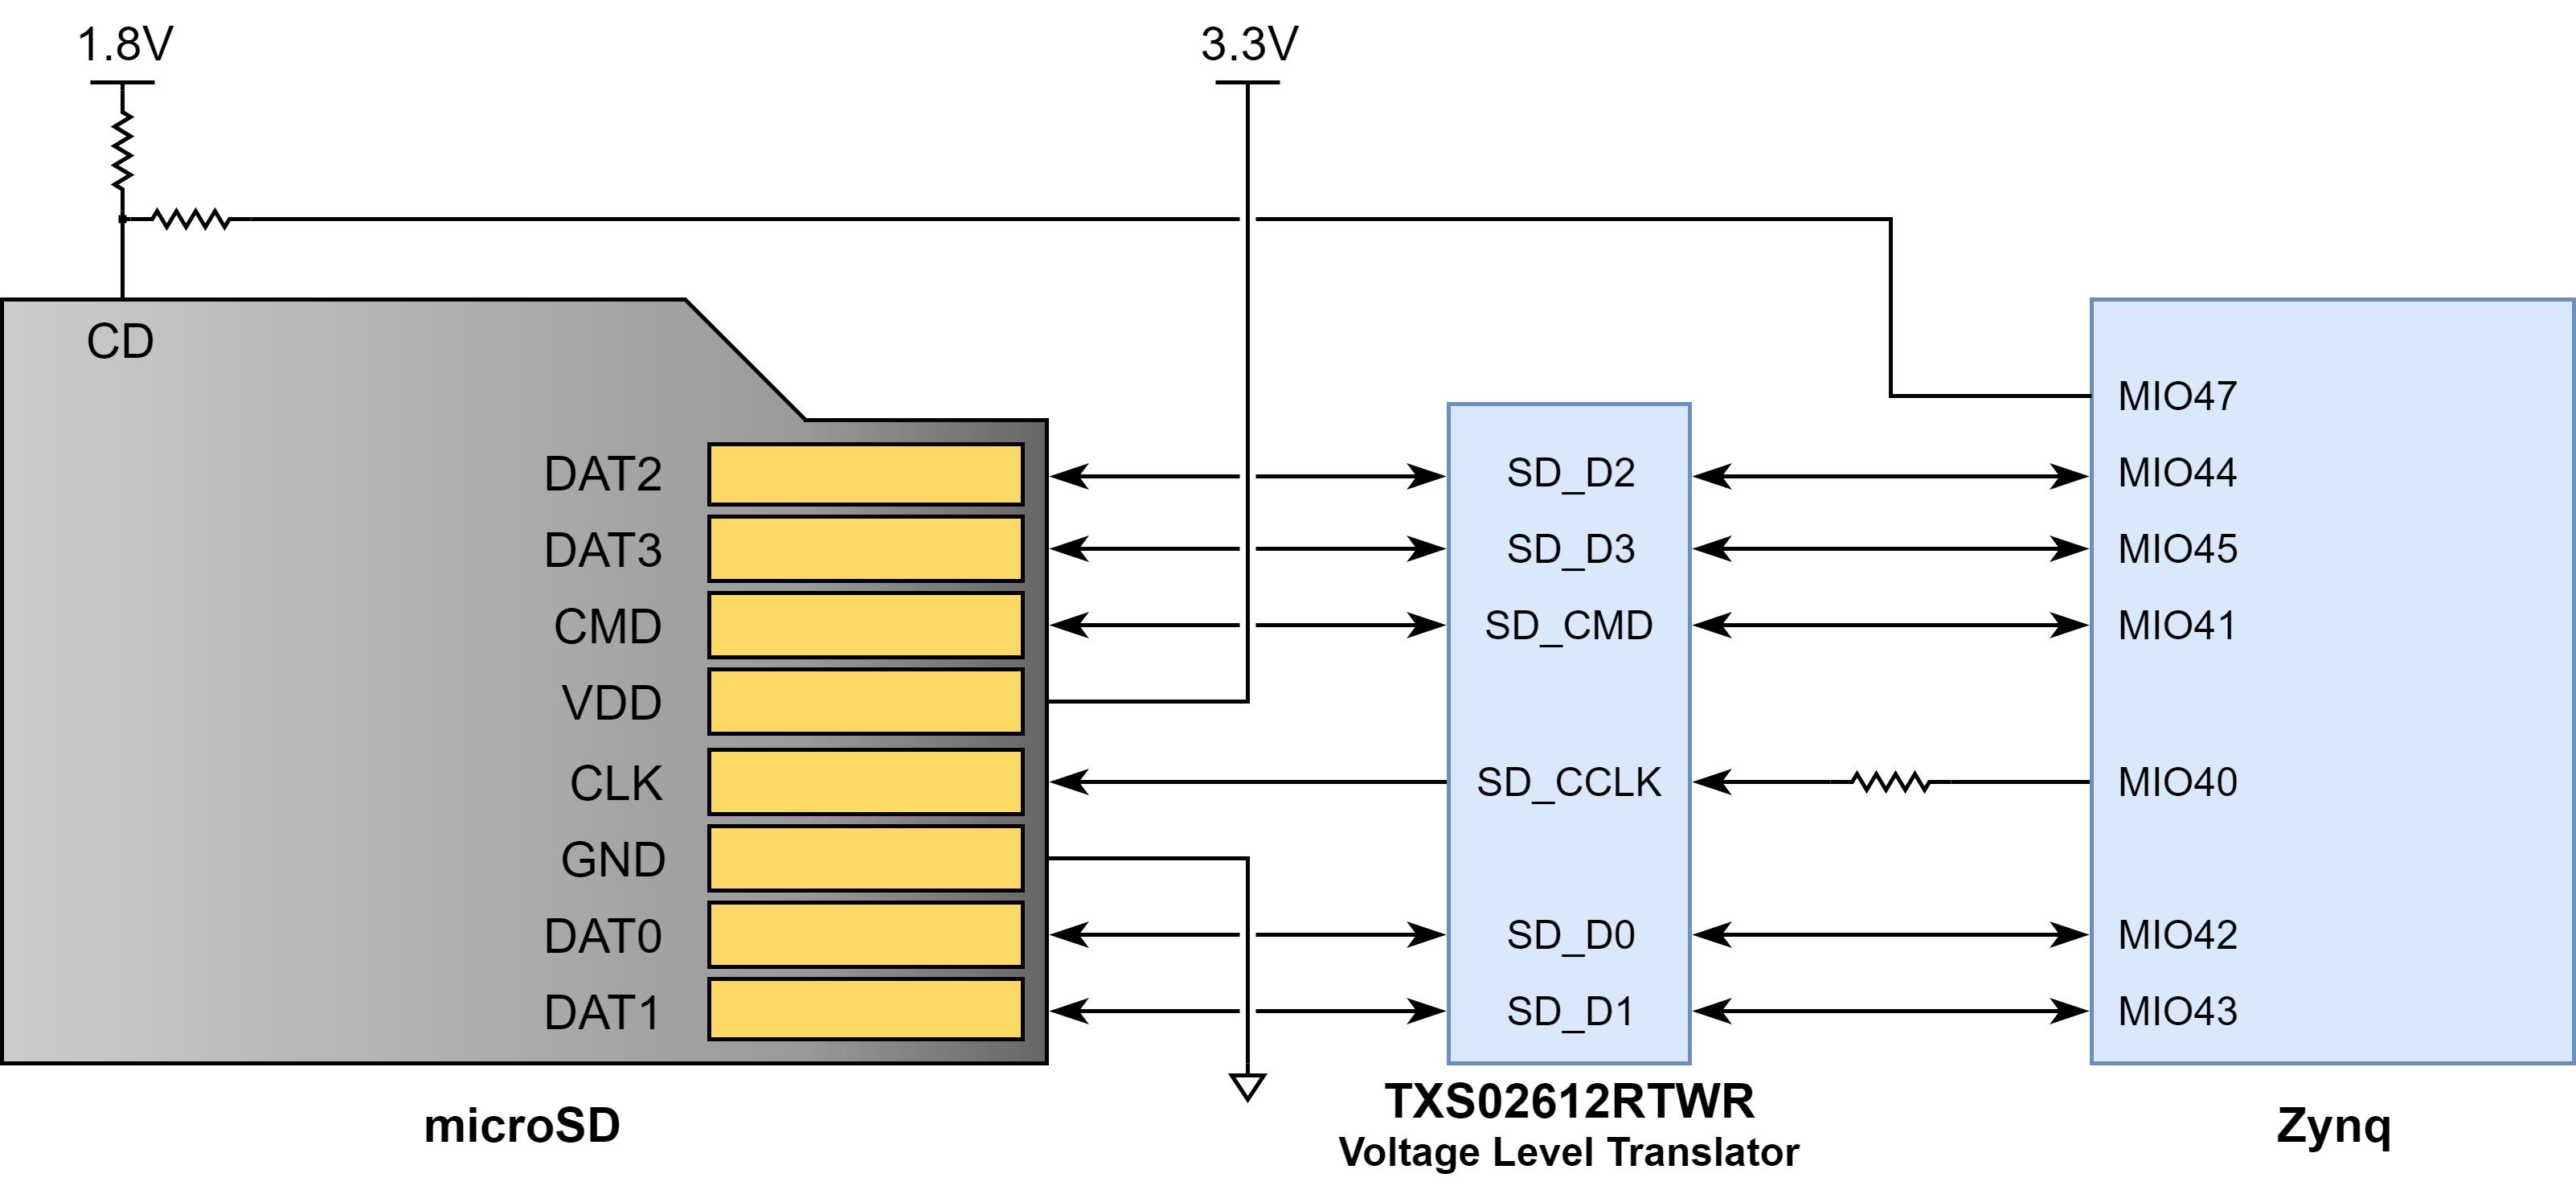 Figure 6.1. microSD slot signals